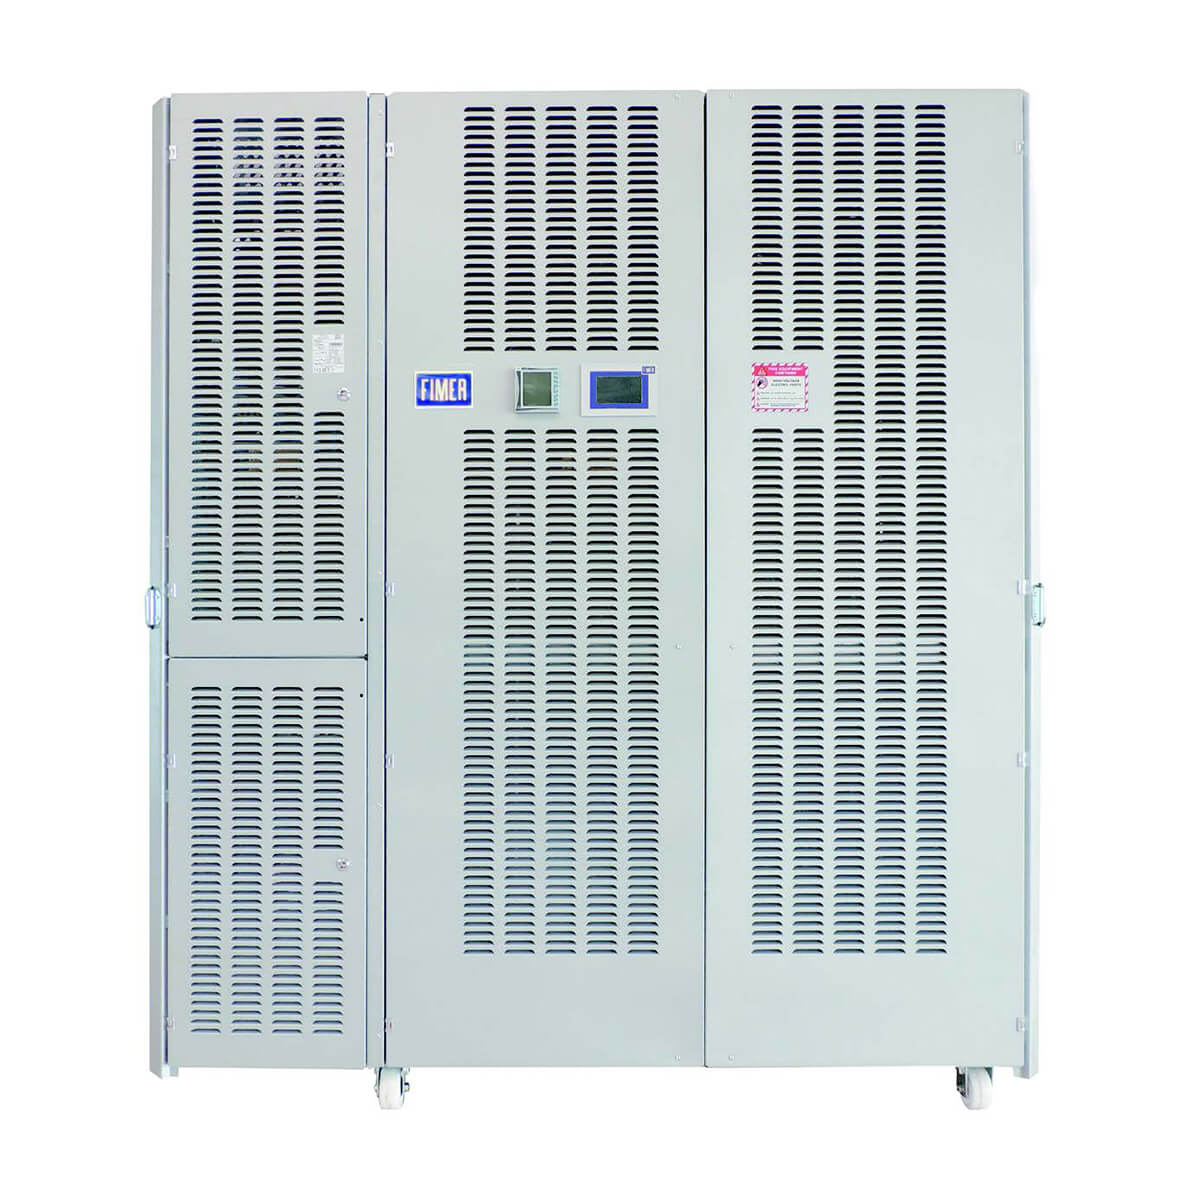 abb fimer 850kW inverter, abb fimer r9000tl 850kW inverter, abb fimer r9000tl inverter, abb fimer r9000tl, abb fimer 850 kW